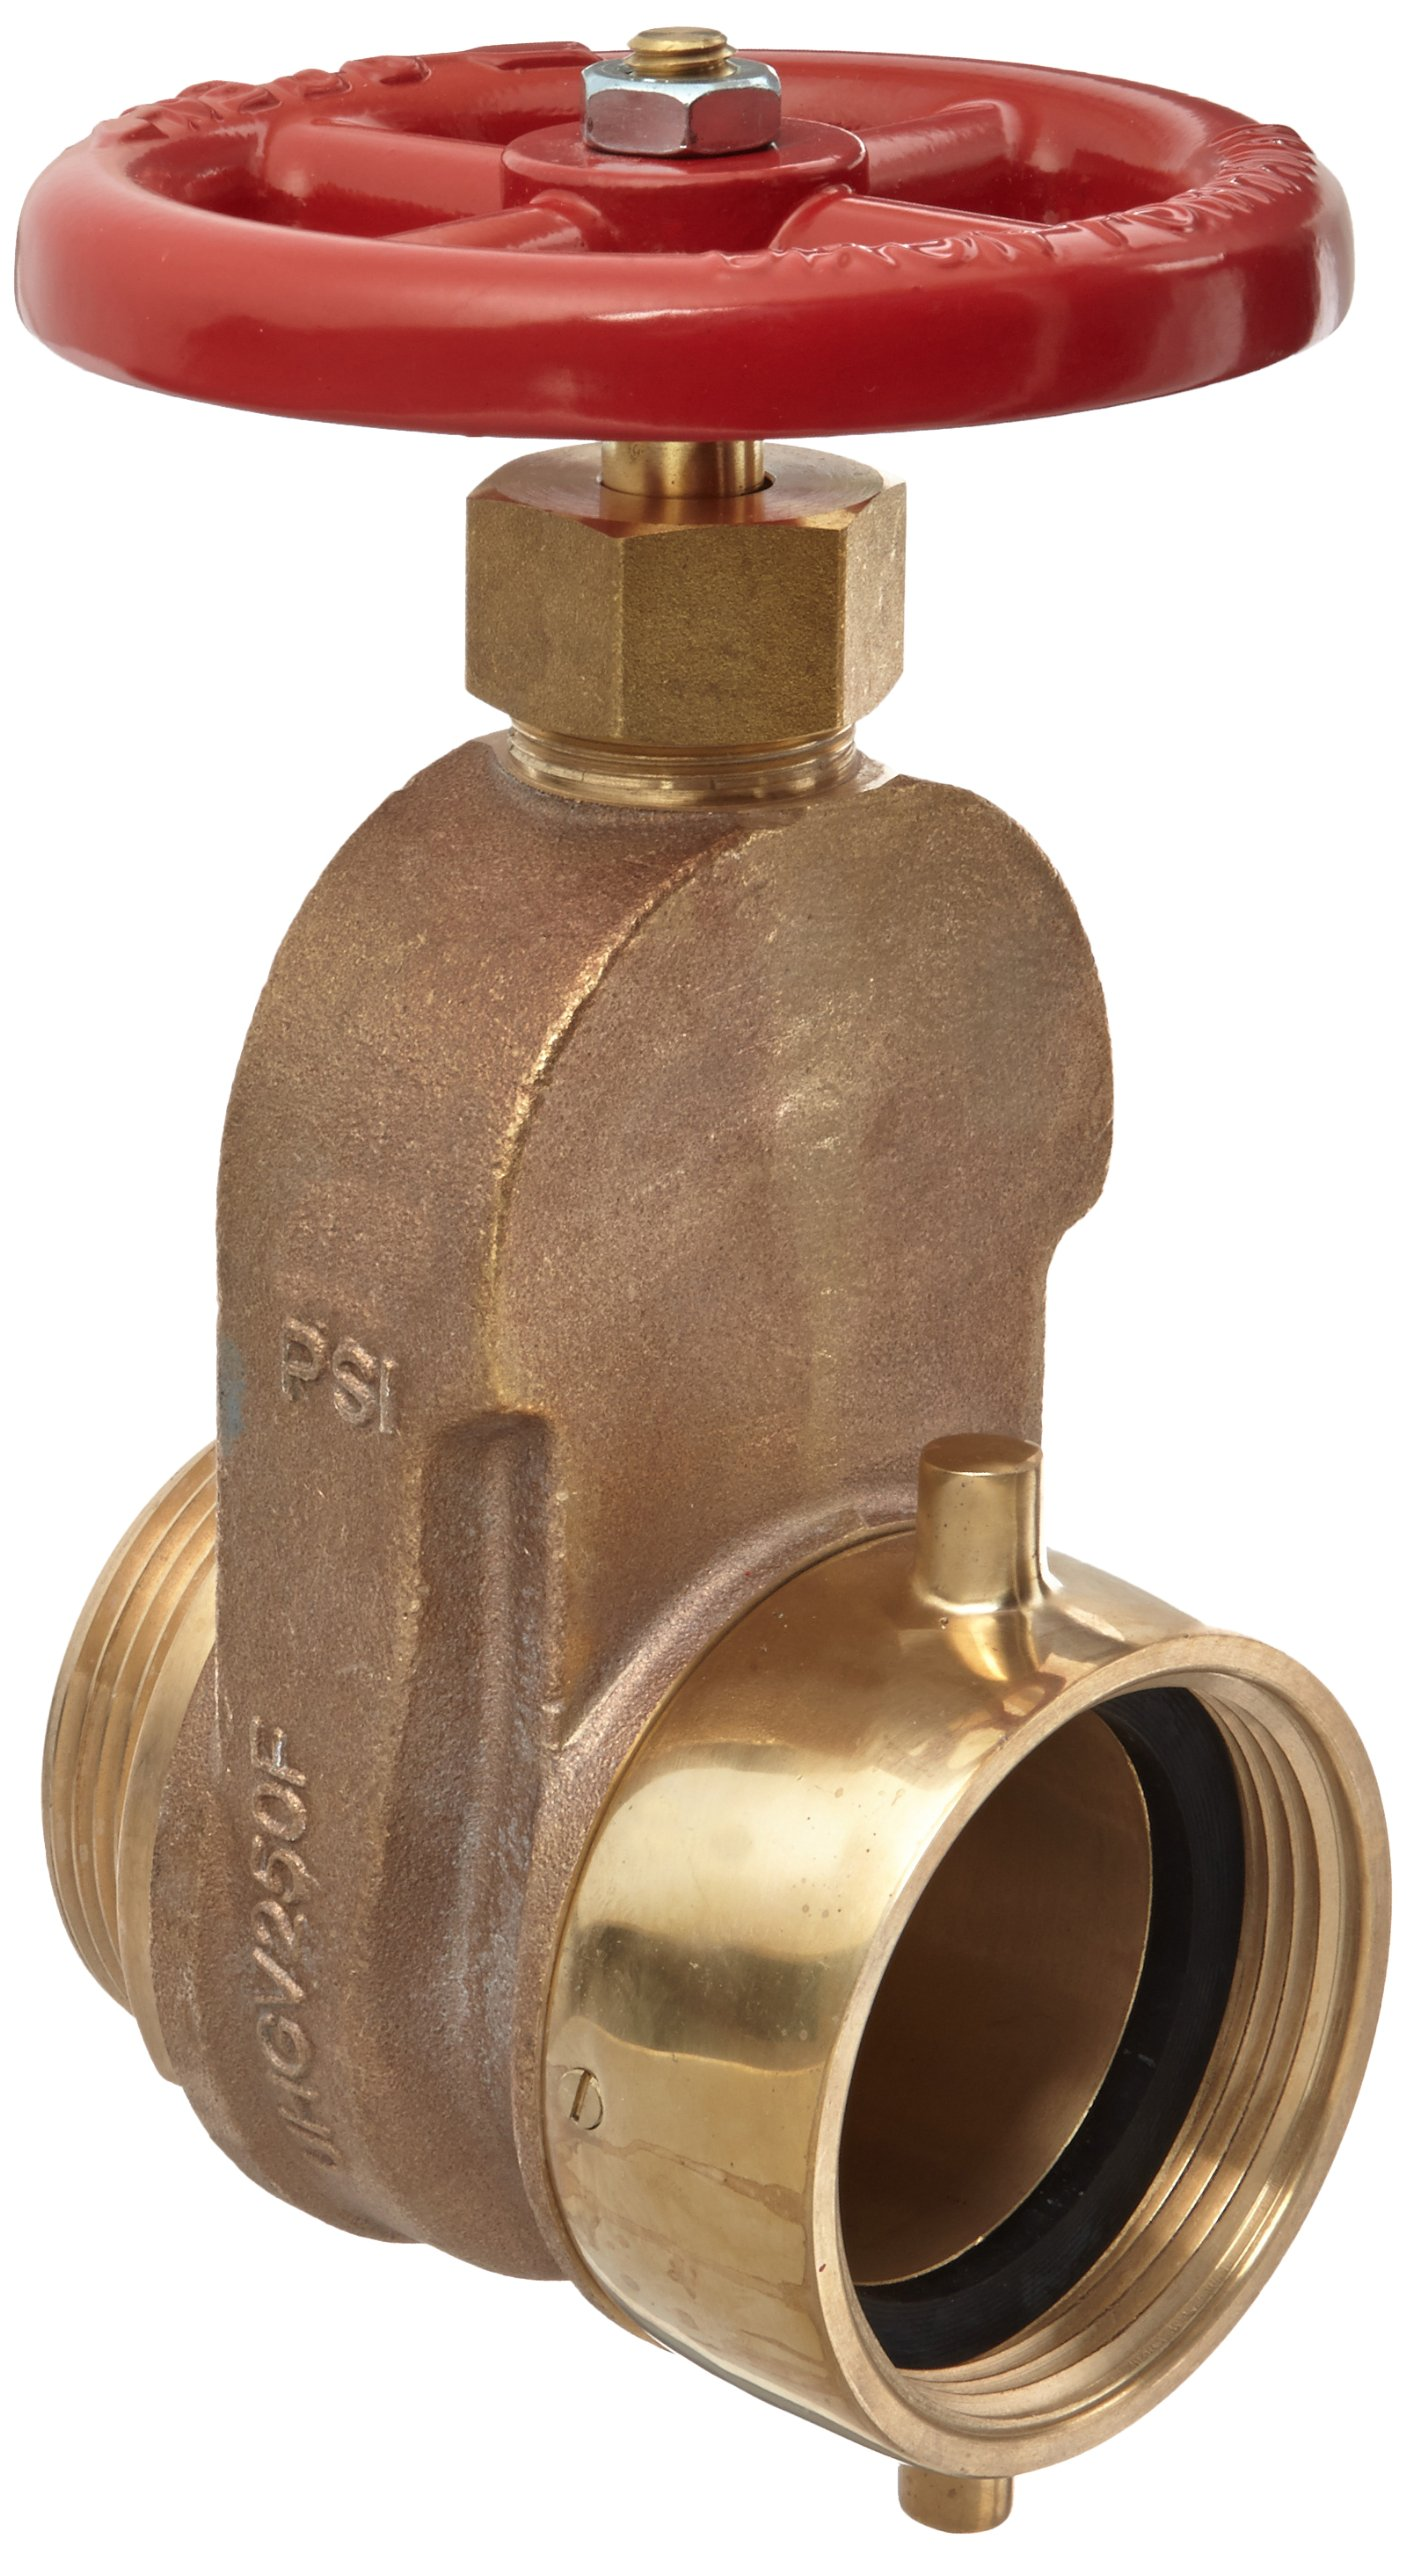 Dixon UHGV250F Brass Single Hydrant Gate Valve with Handwheel, 2-1/2'' NST female x NST male